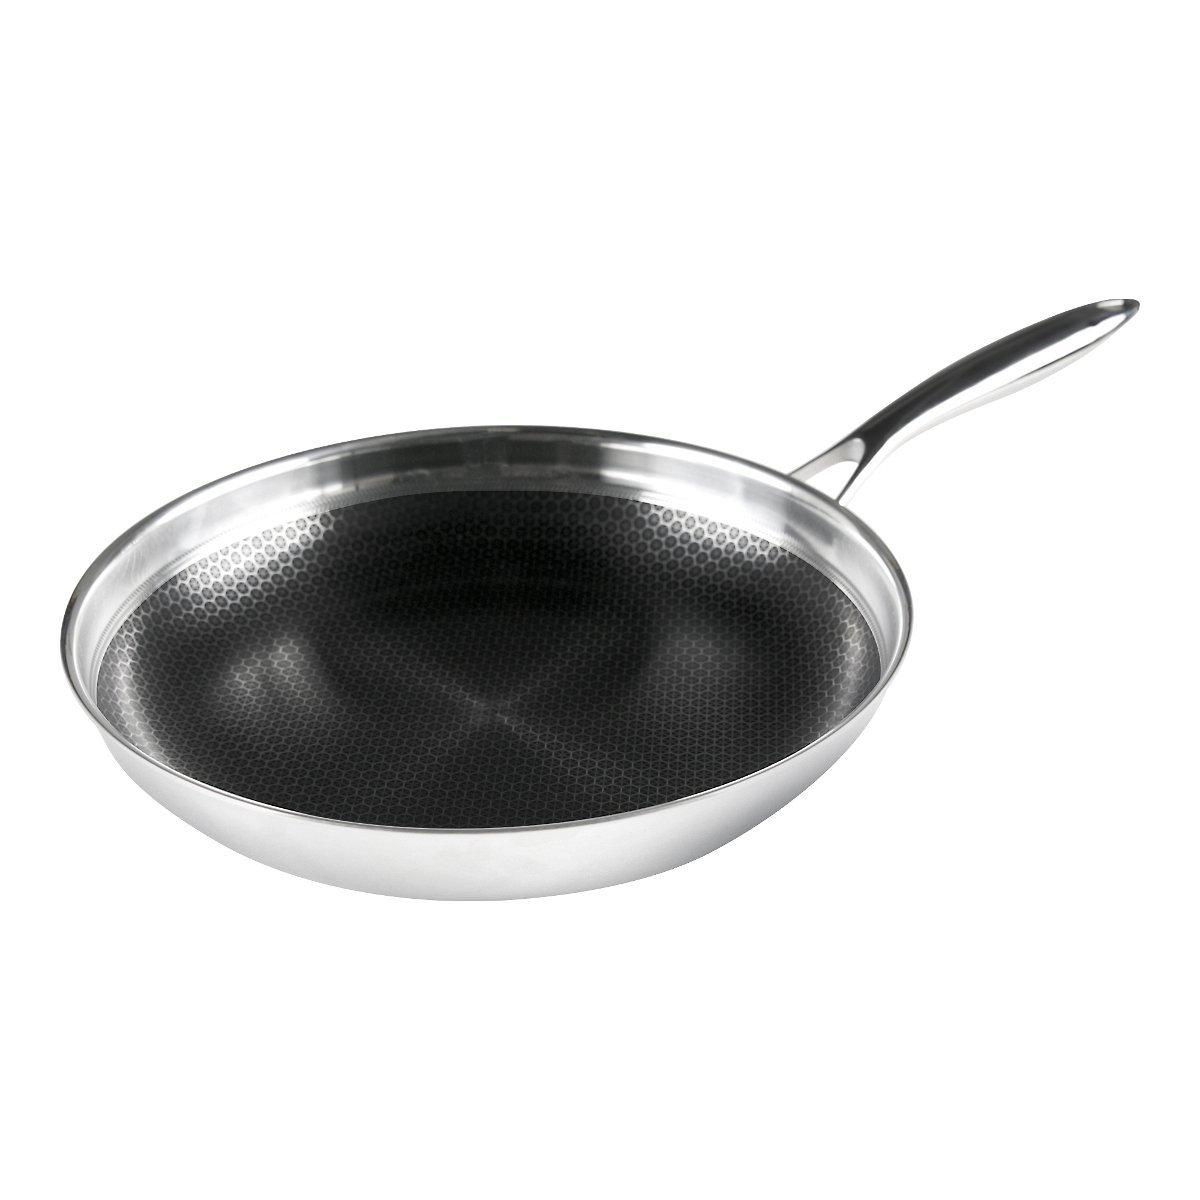 Black Cube fry pan 12 1/2